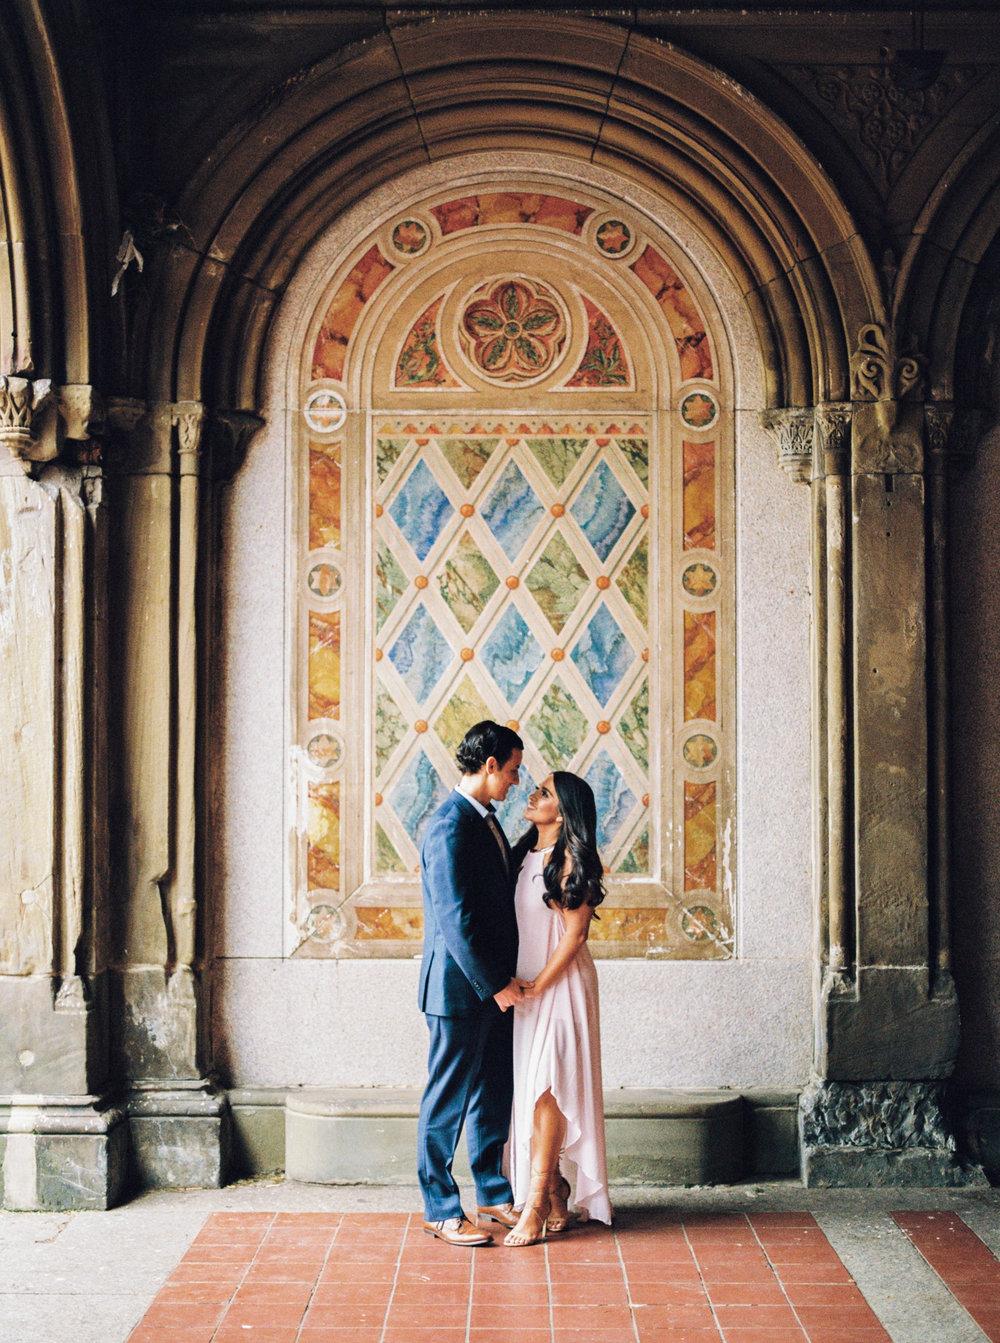 Michelle & Matthew | Central Park, NYC Engagement